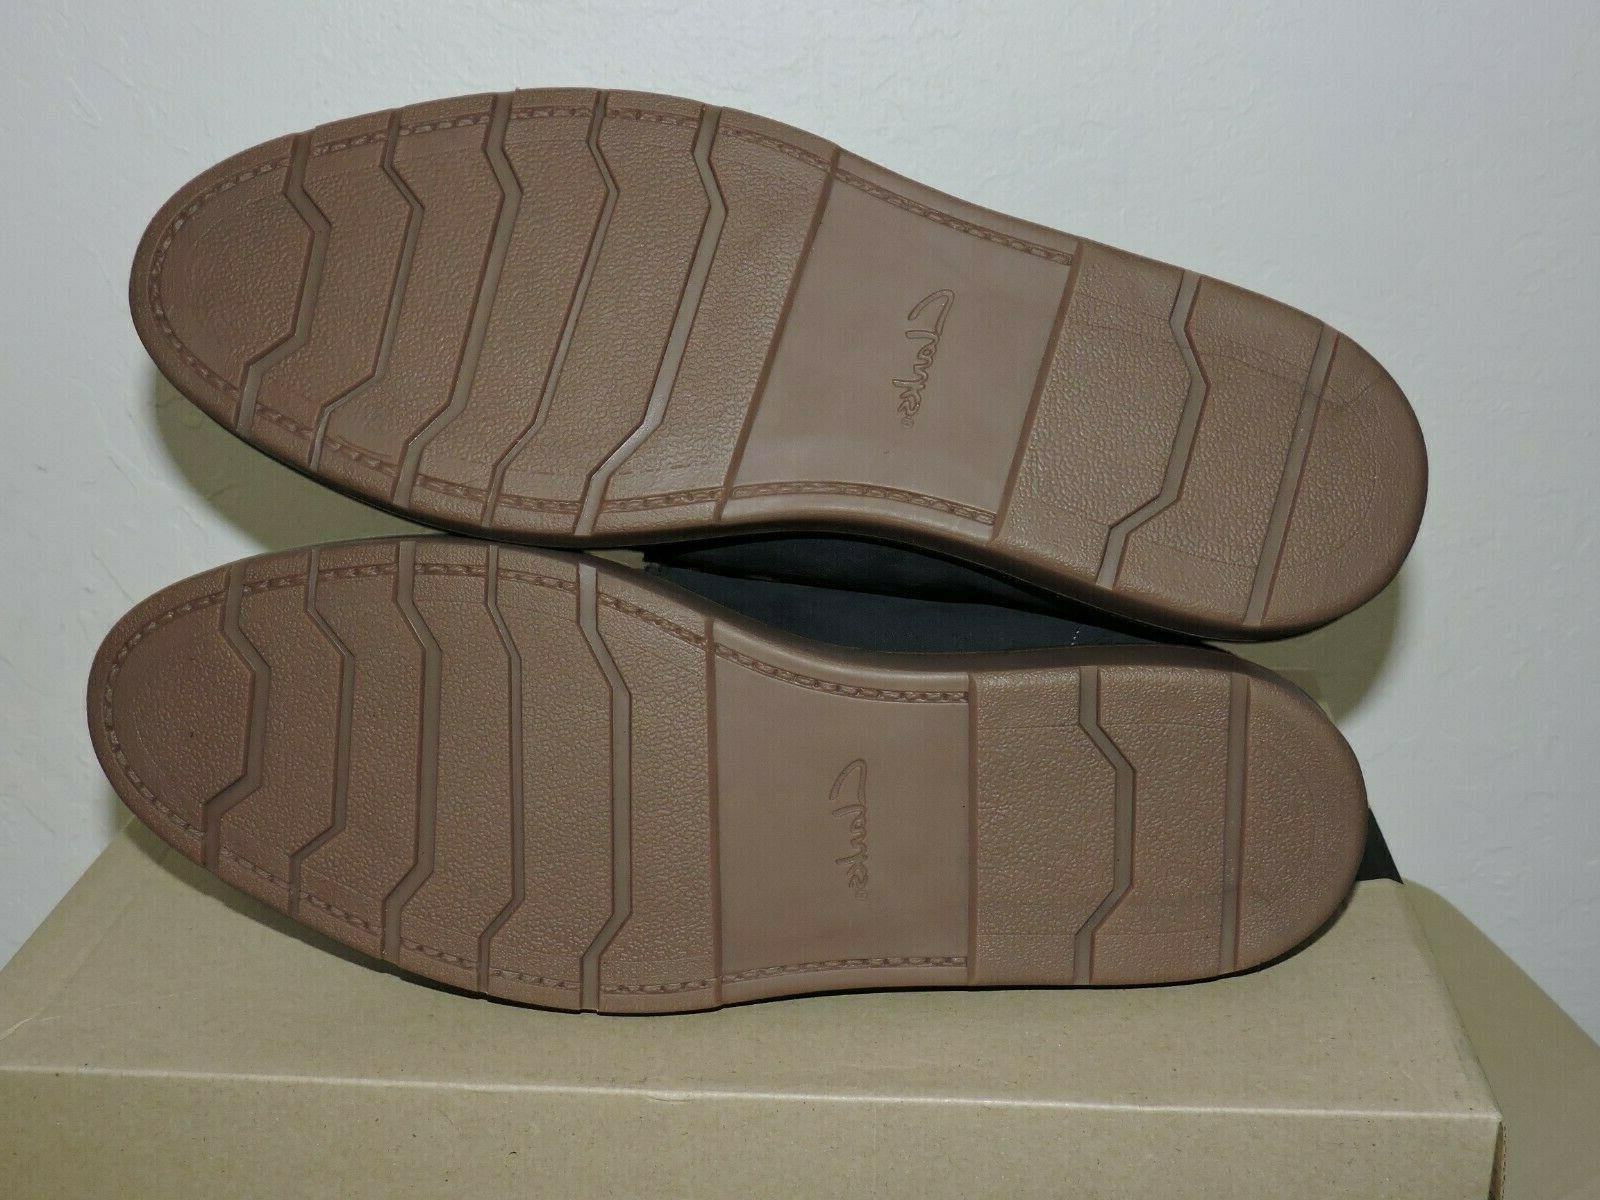 Clarks 26136447 Grandin Boots Size